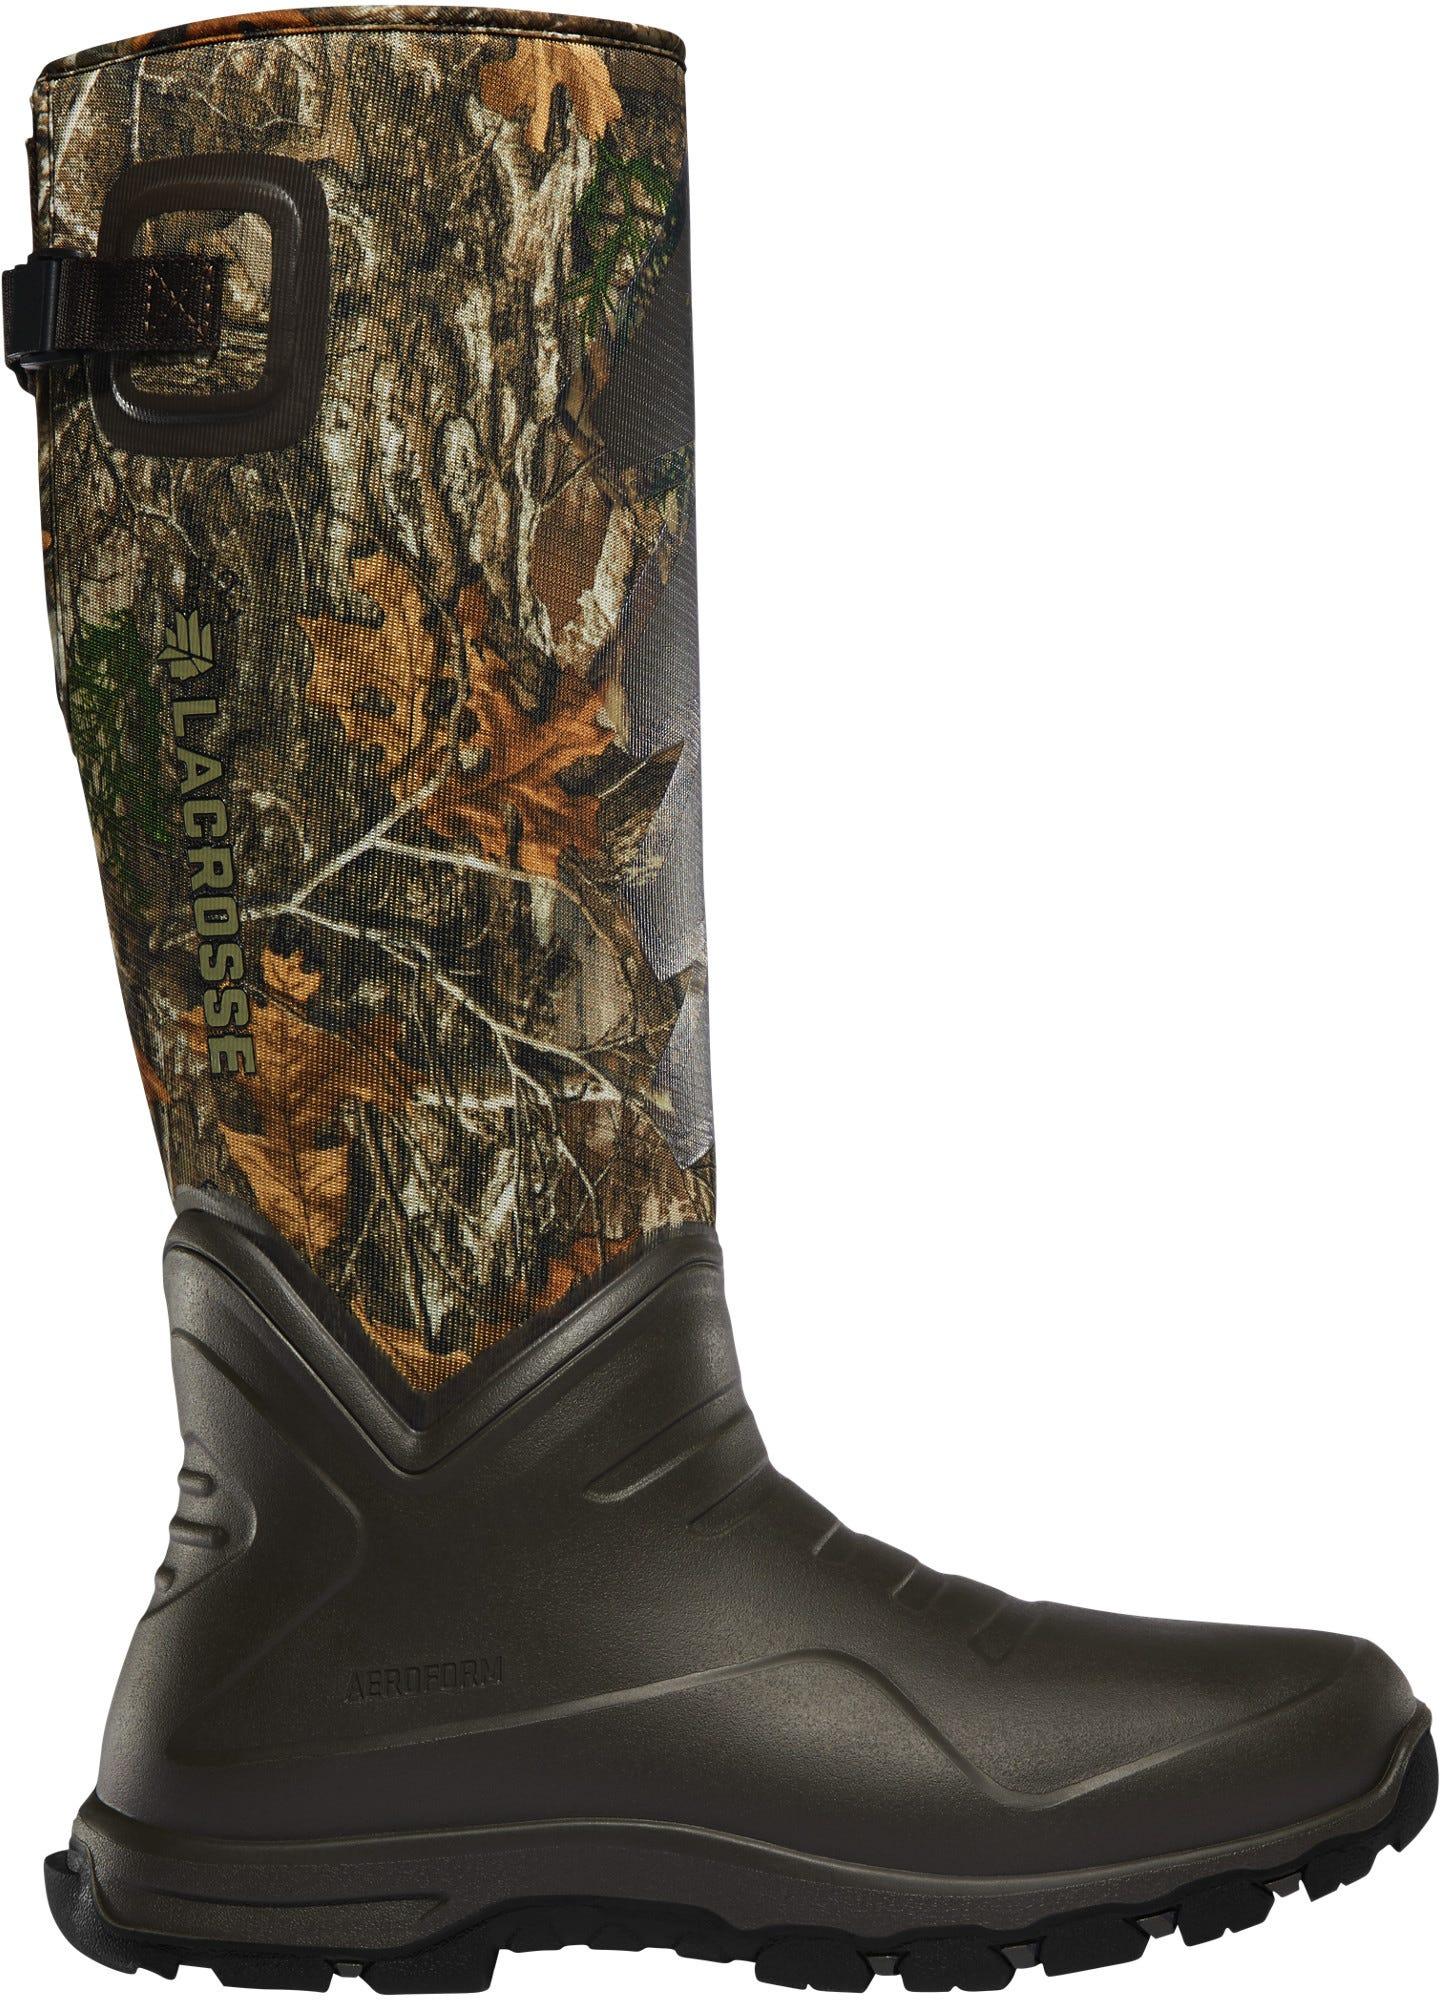 LACROSSE Aerohead Sport Men's Hunting Boots   SAIL